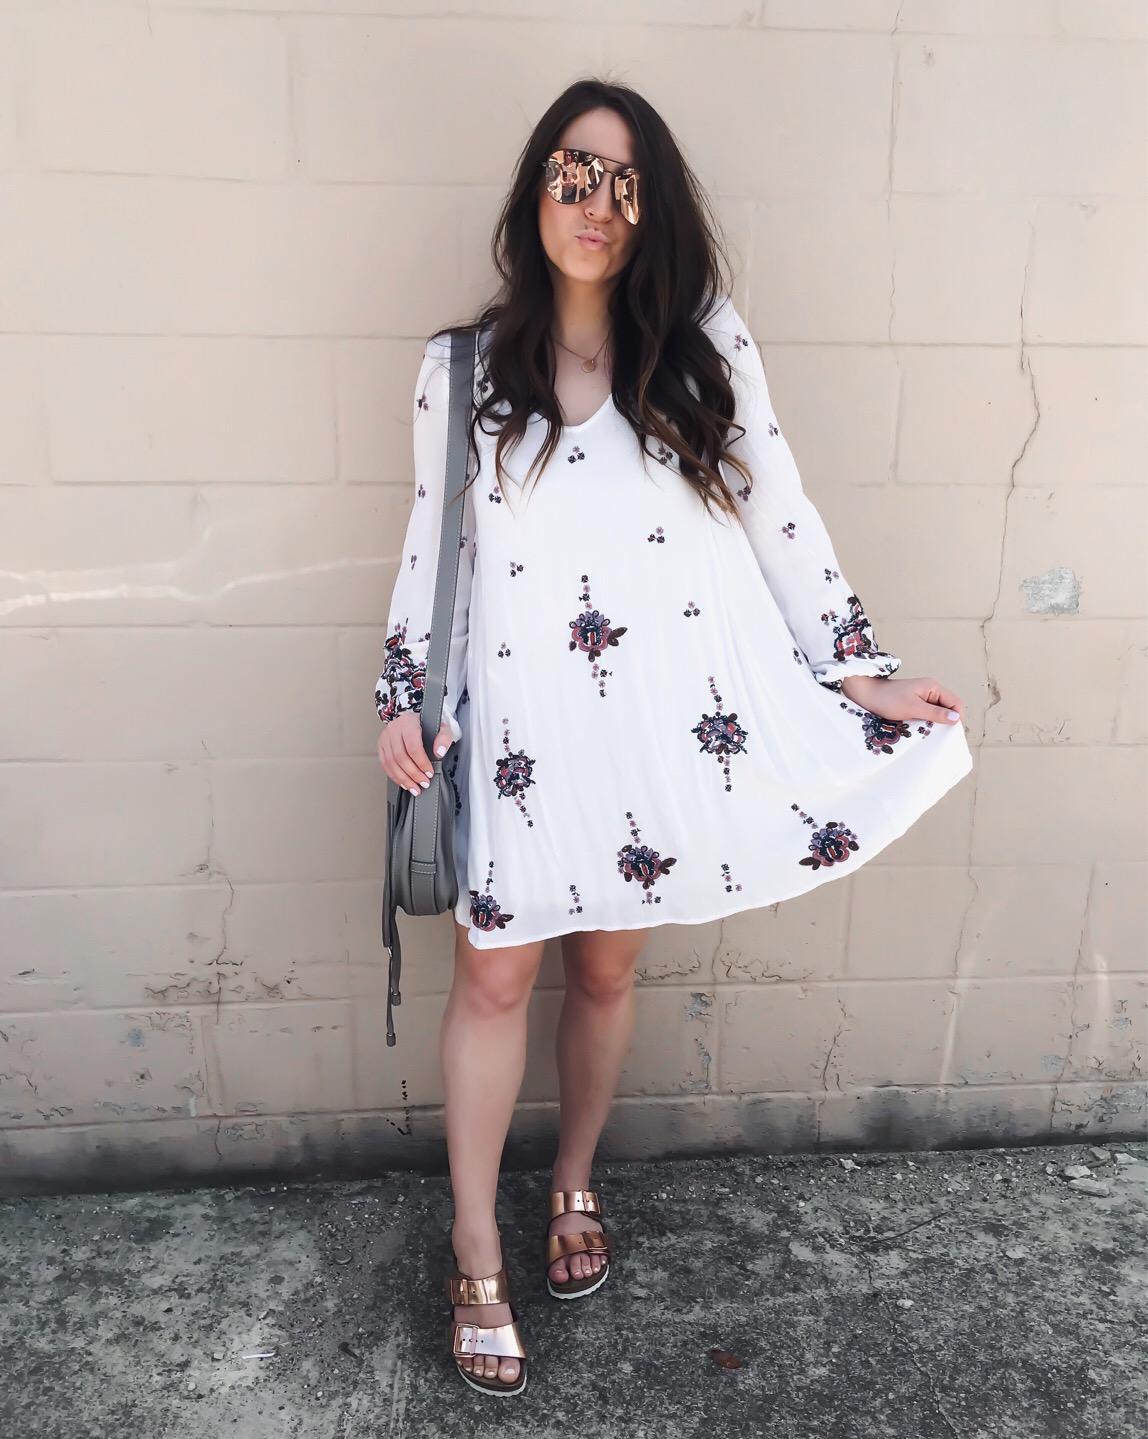 Instagram Round Up | Pine Barren Beauty | free people dress, summer dress, rose gold Birkenstocks, summer outfit